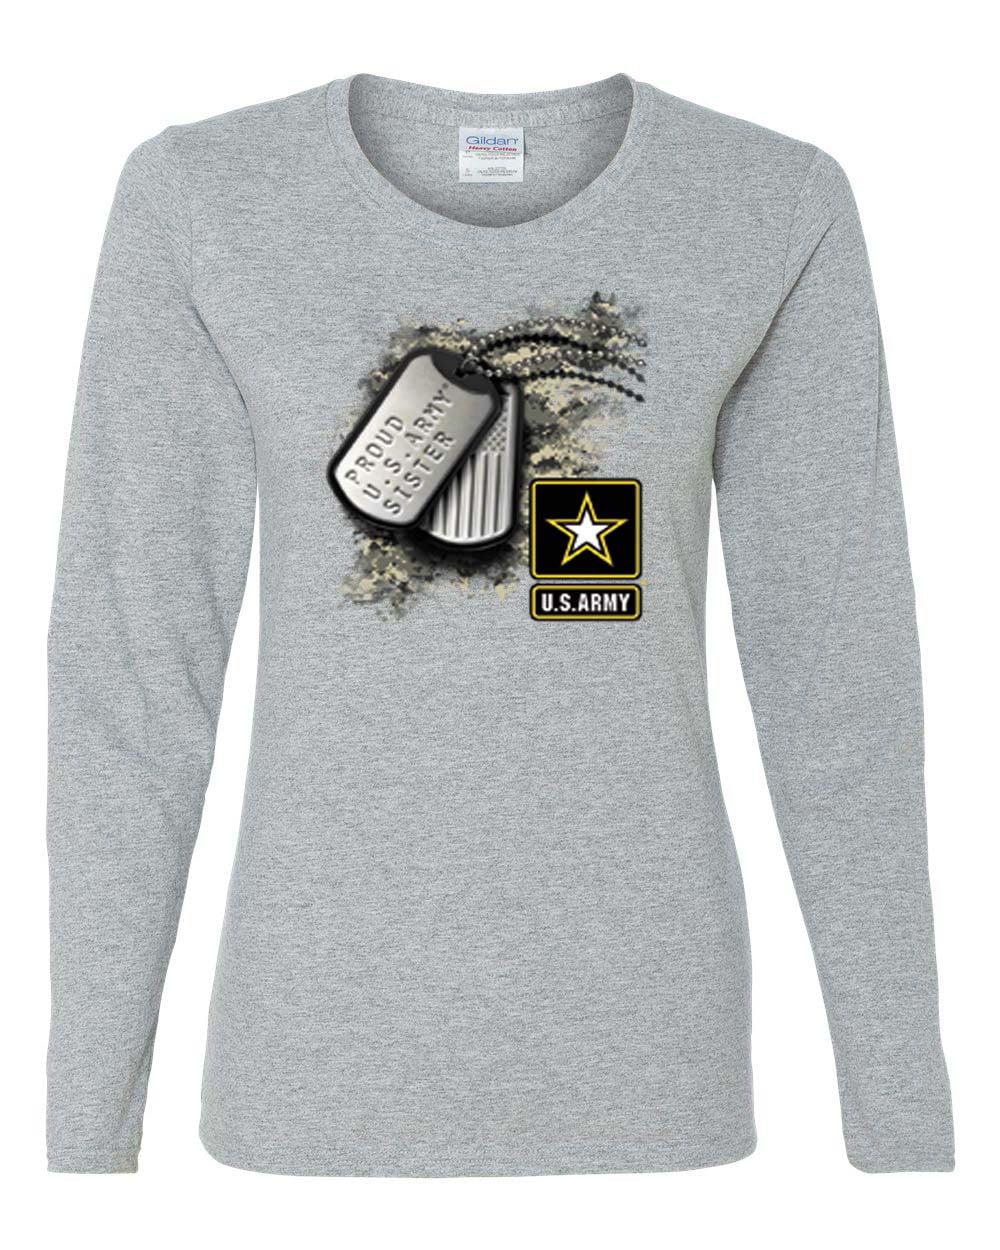 Custom Apparel R Us Proud U S Army Sister Gift Military Womens